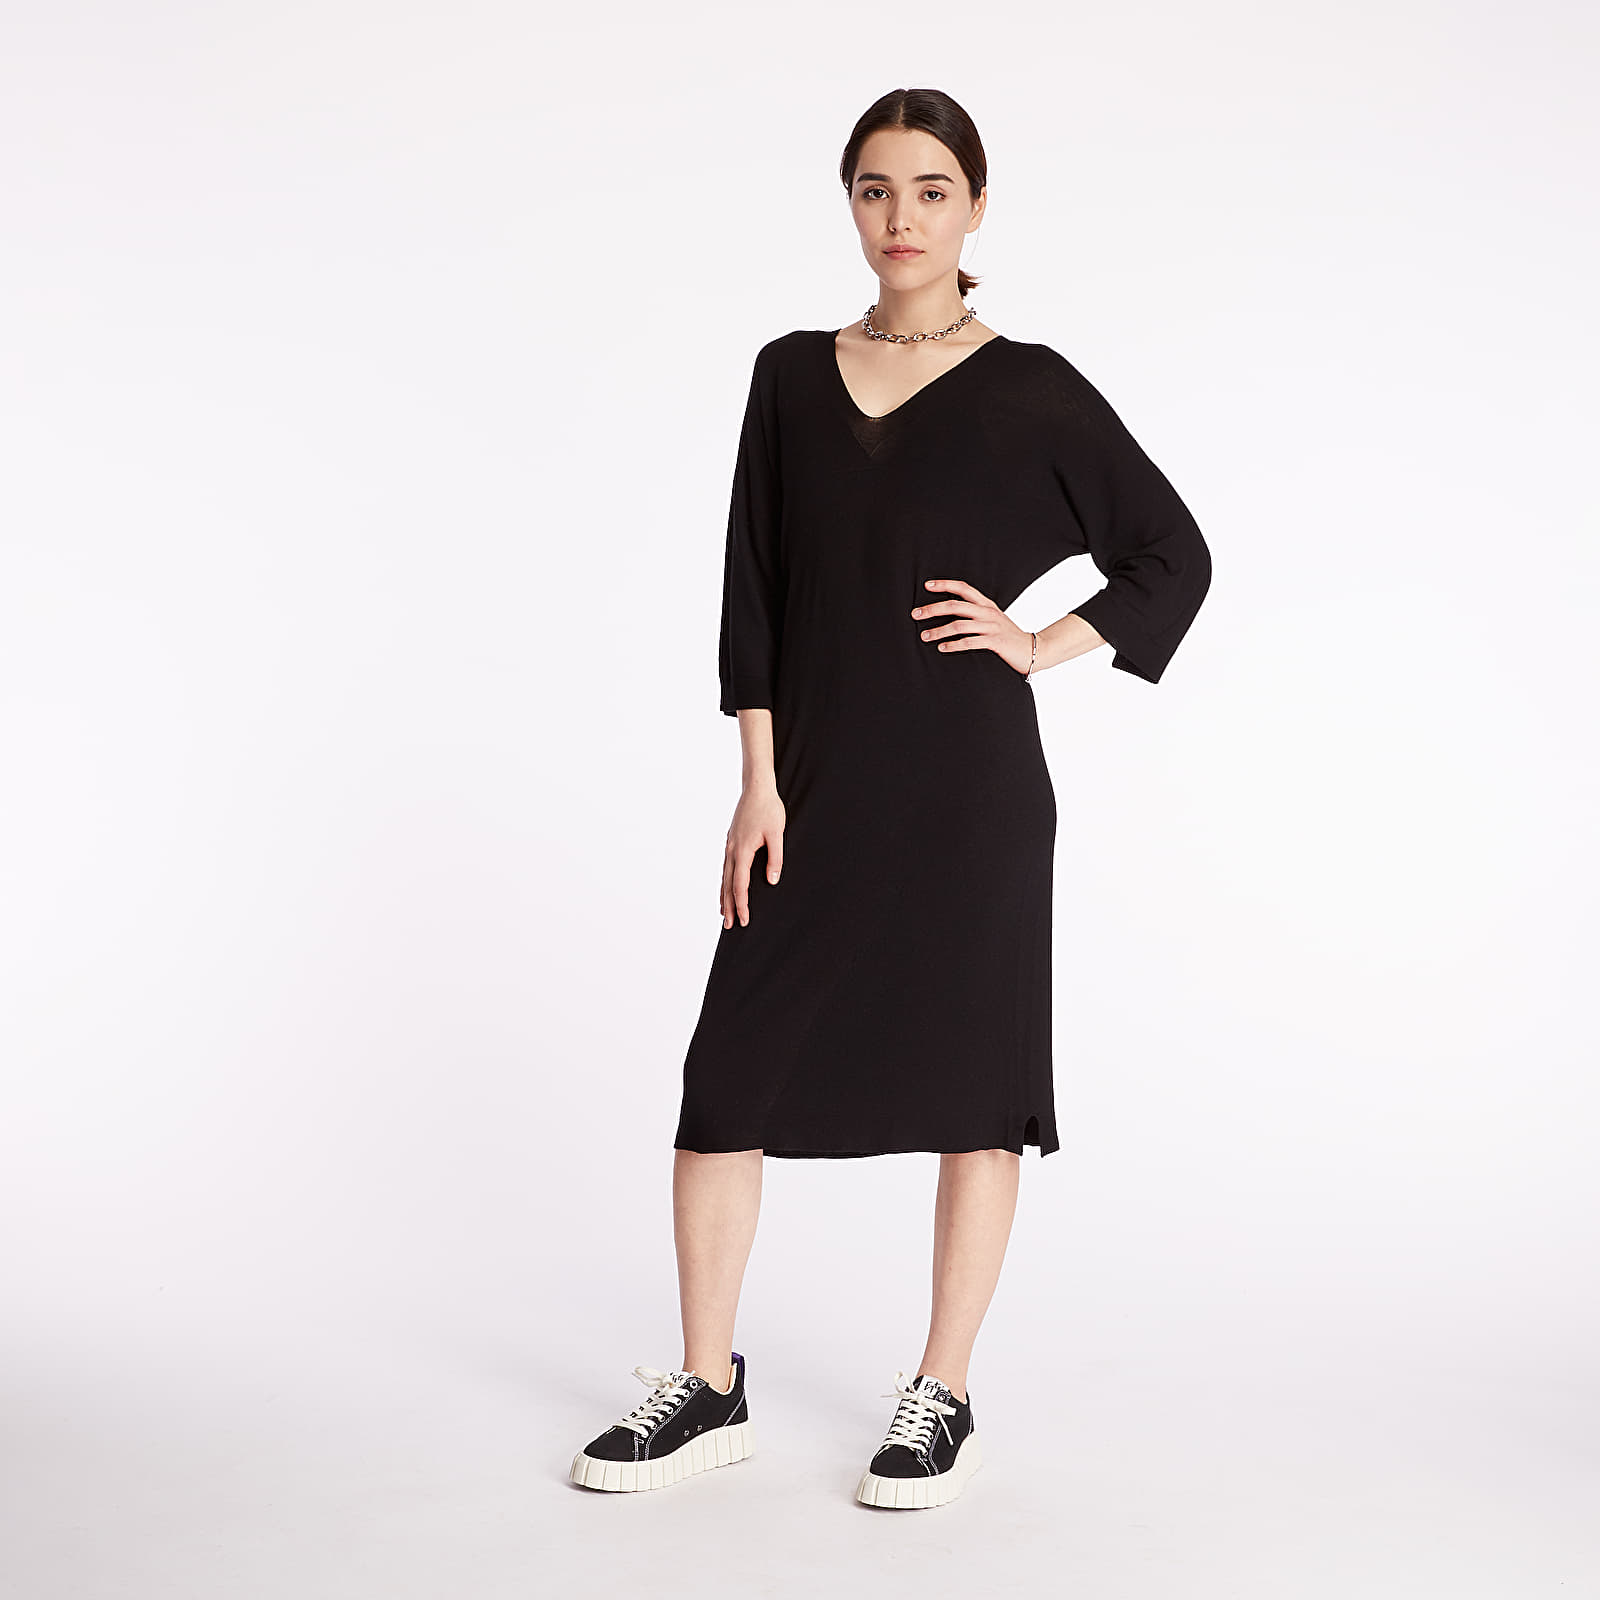 Dress Pietro Filipi Lady's Seamless Knitted Dress Black